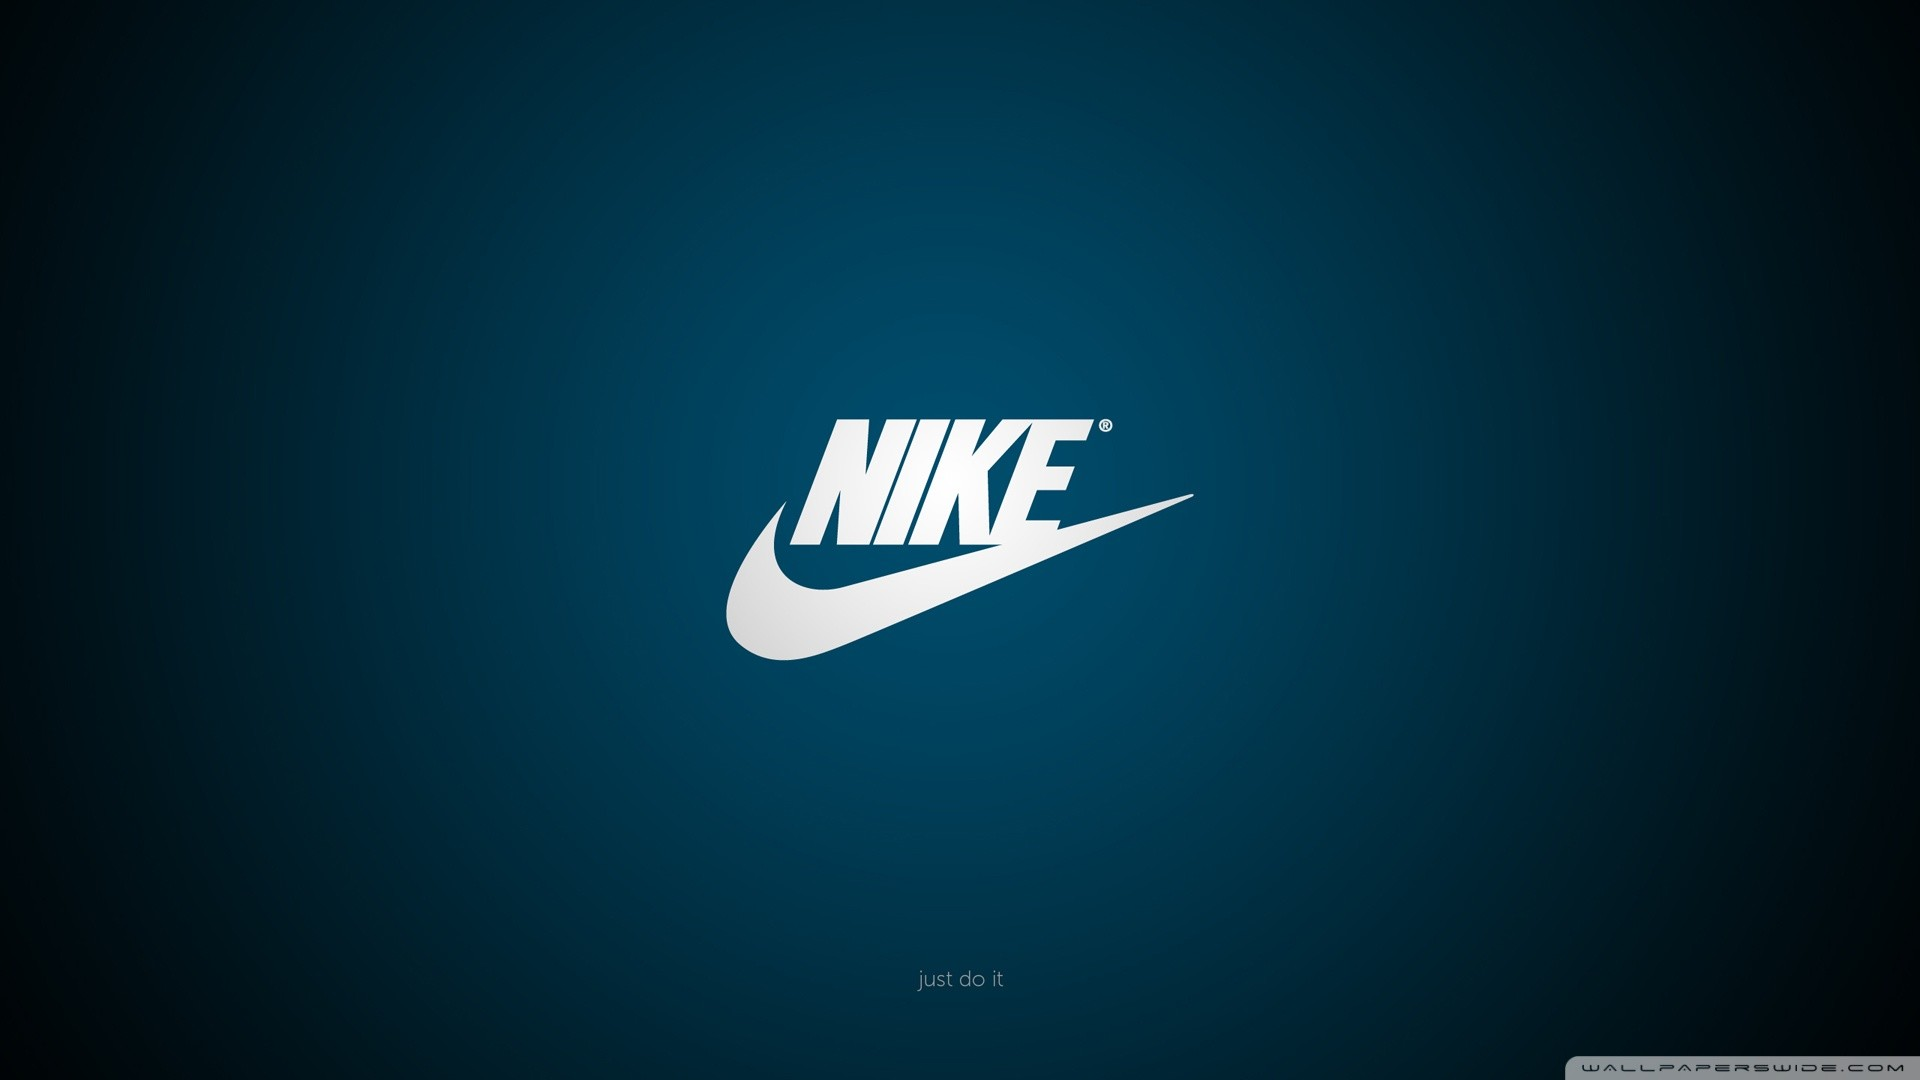 Nike Wallpapers Wide